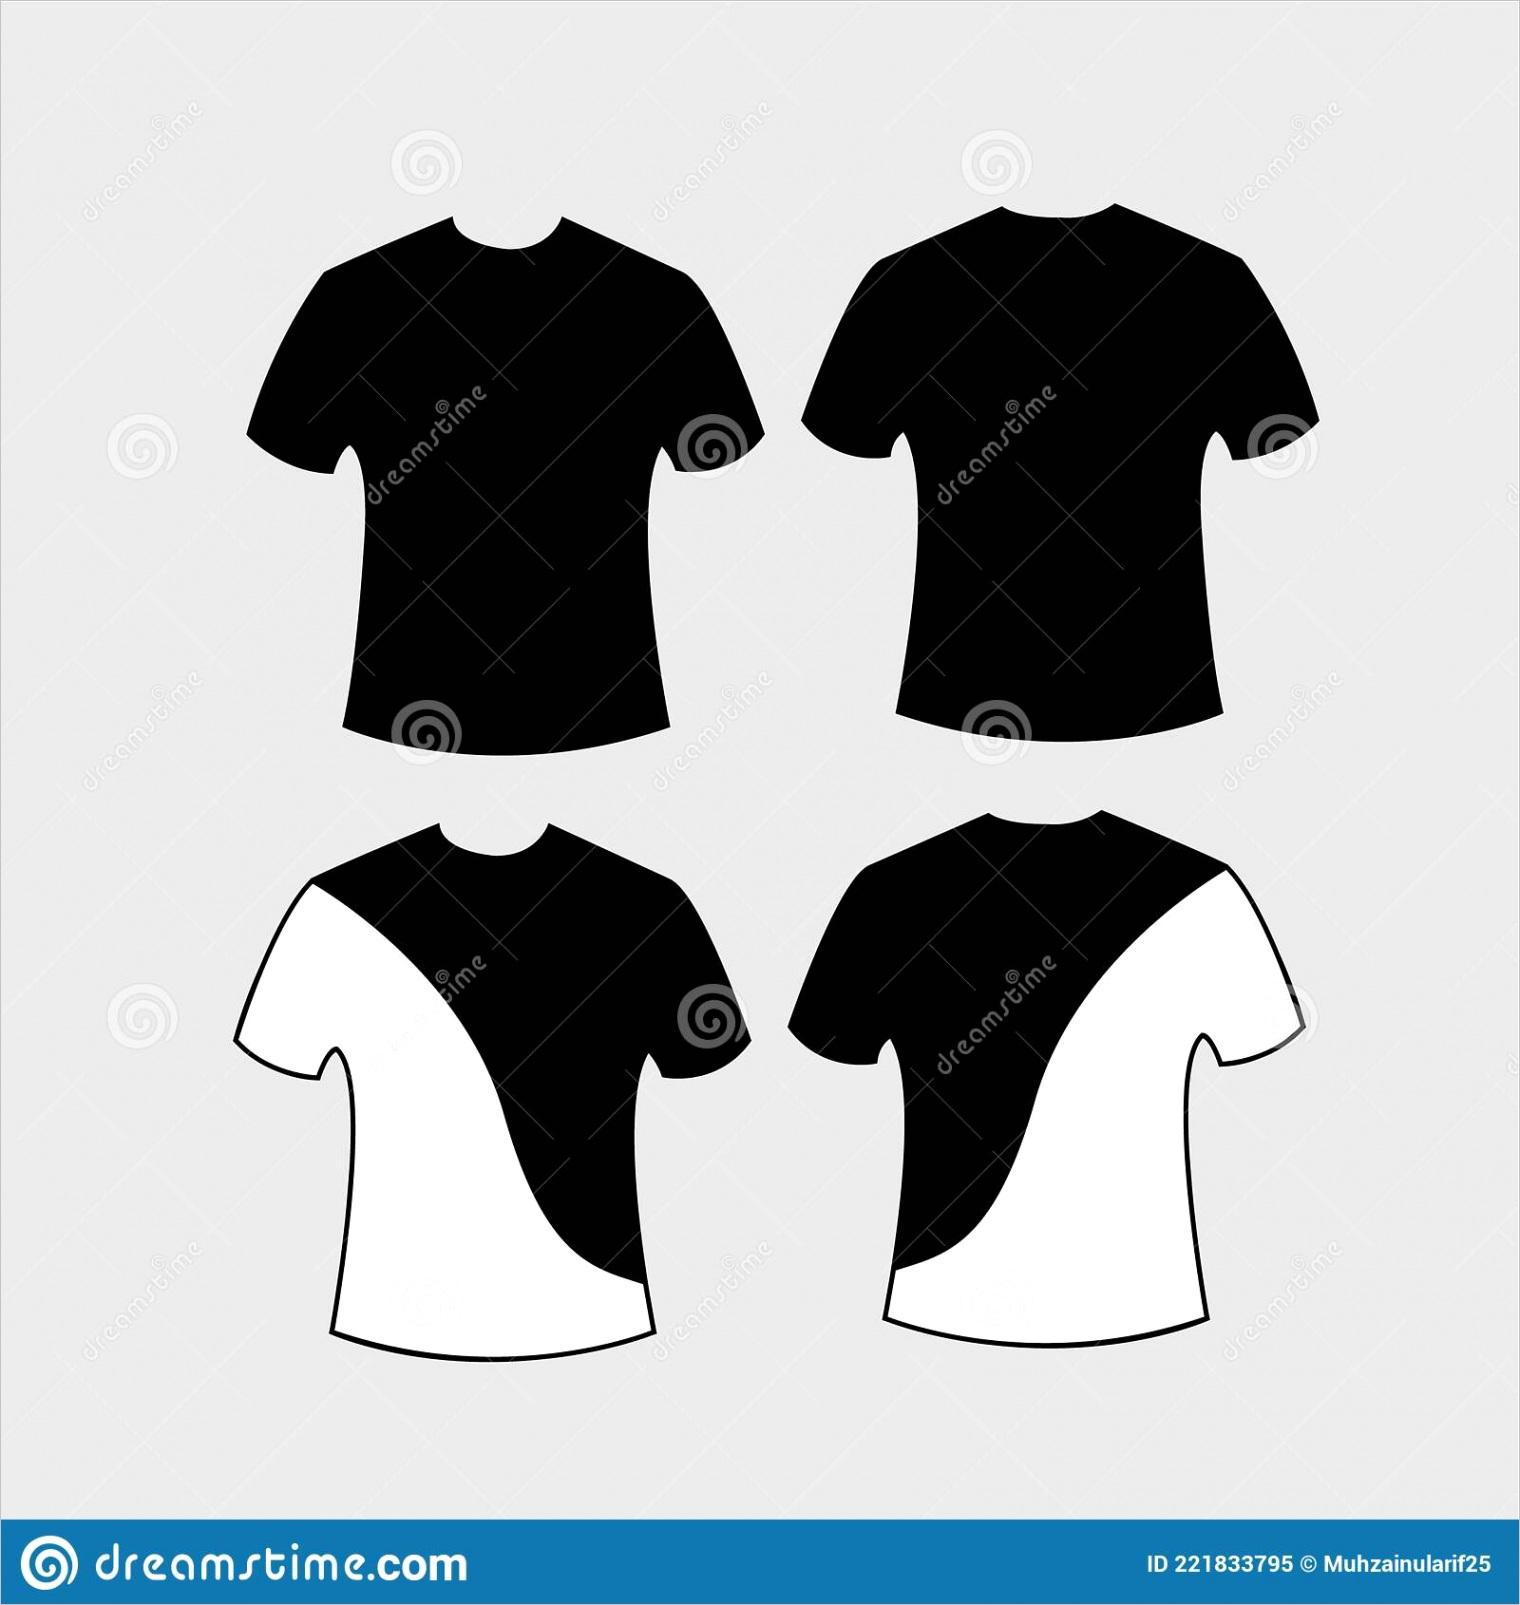 blank black t shirt mockup template front back view isolated plain white sweatshirt design background image